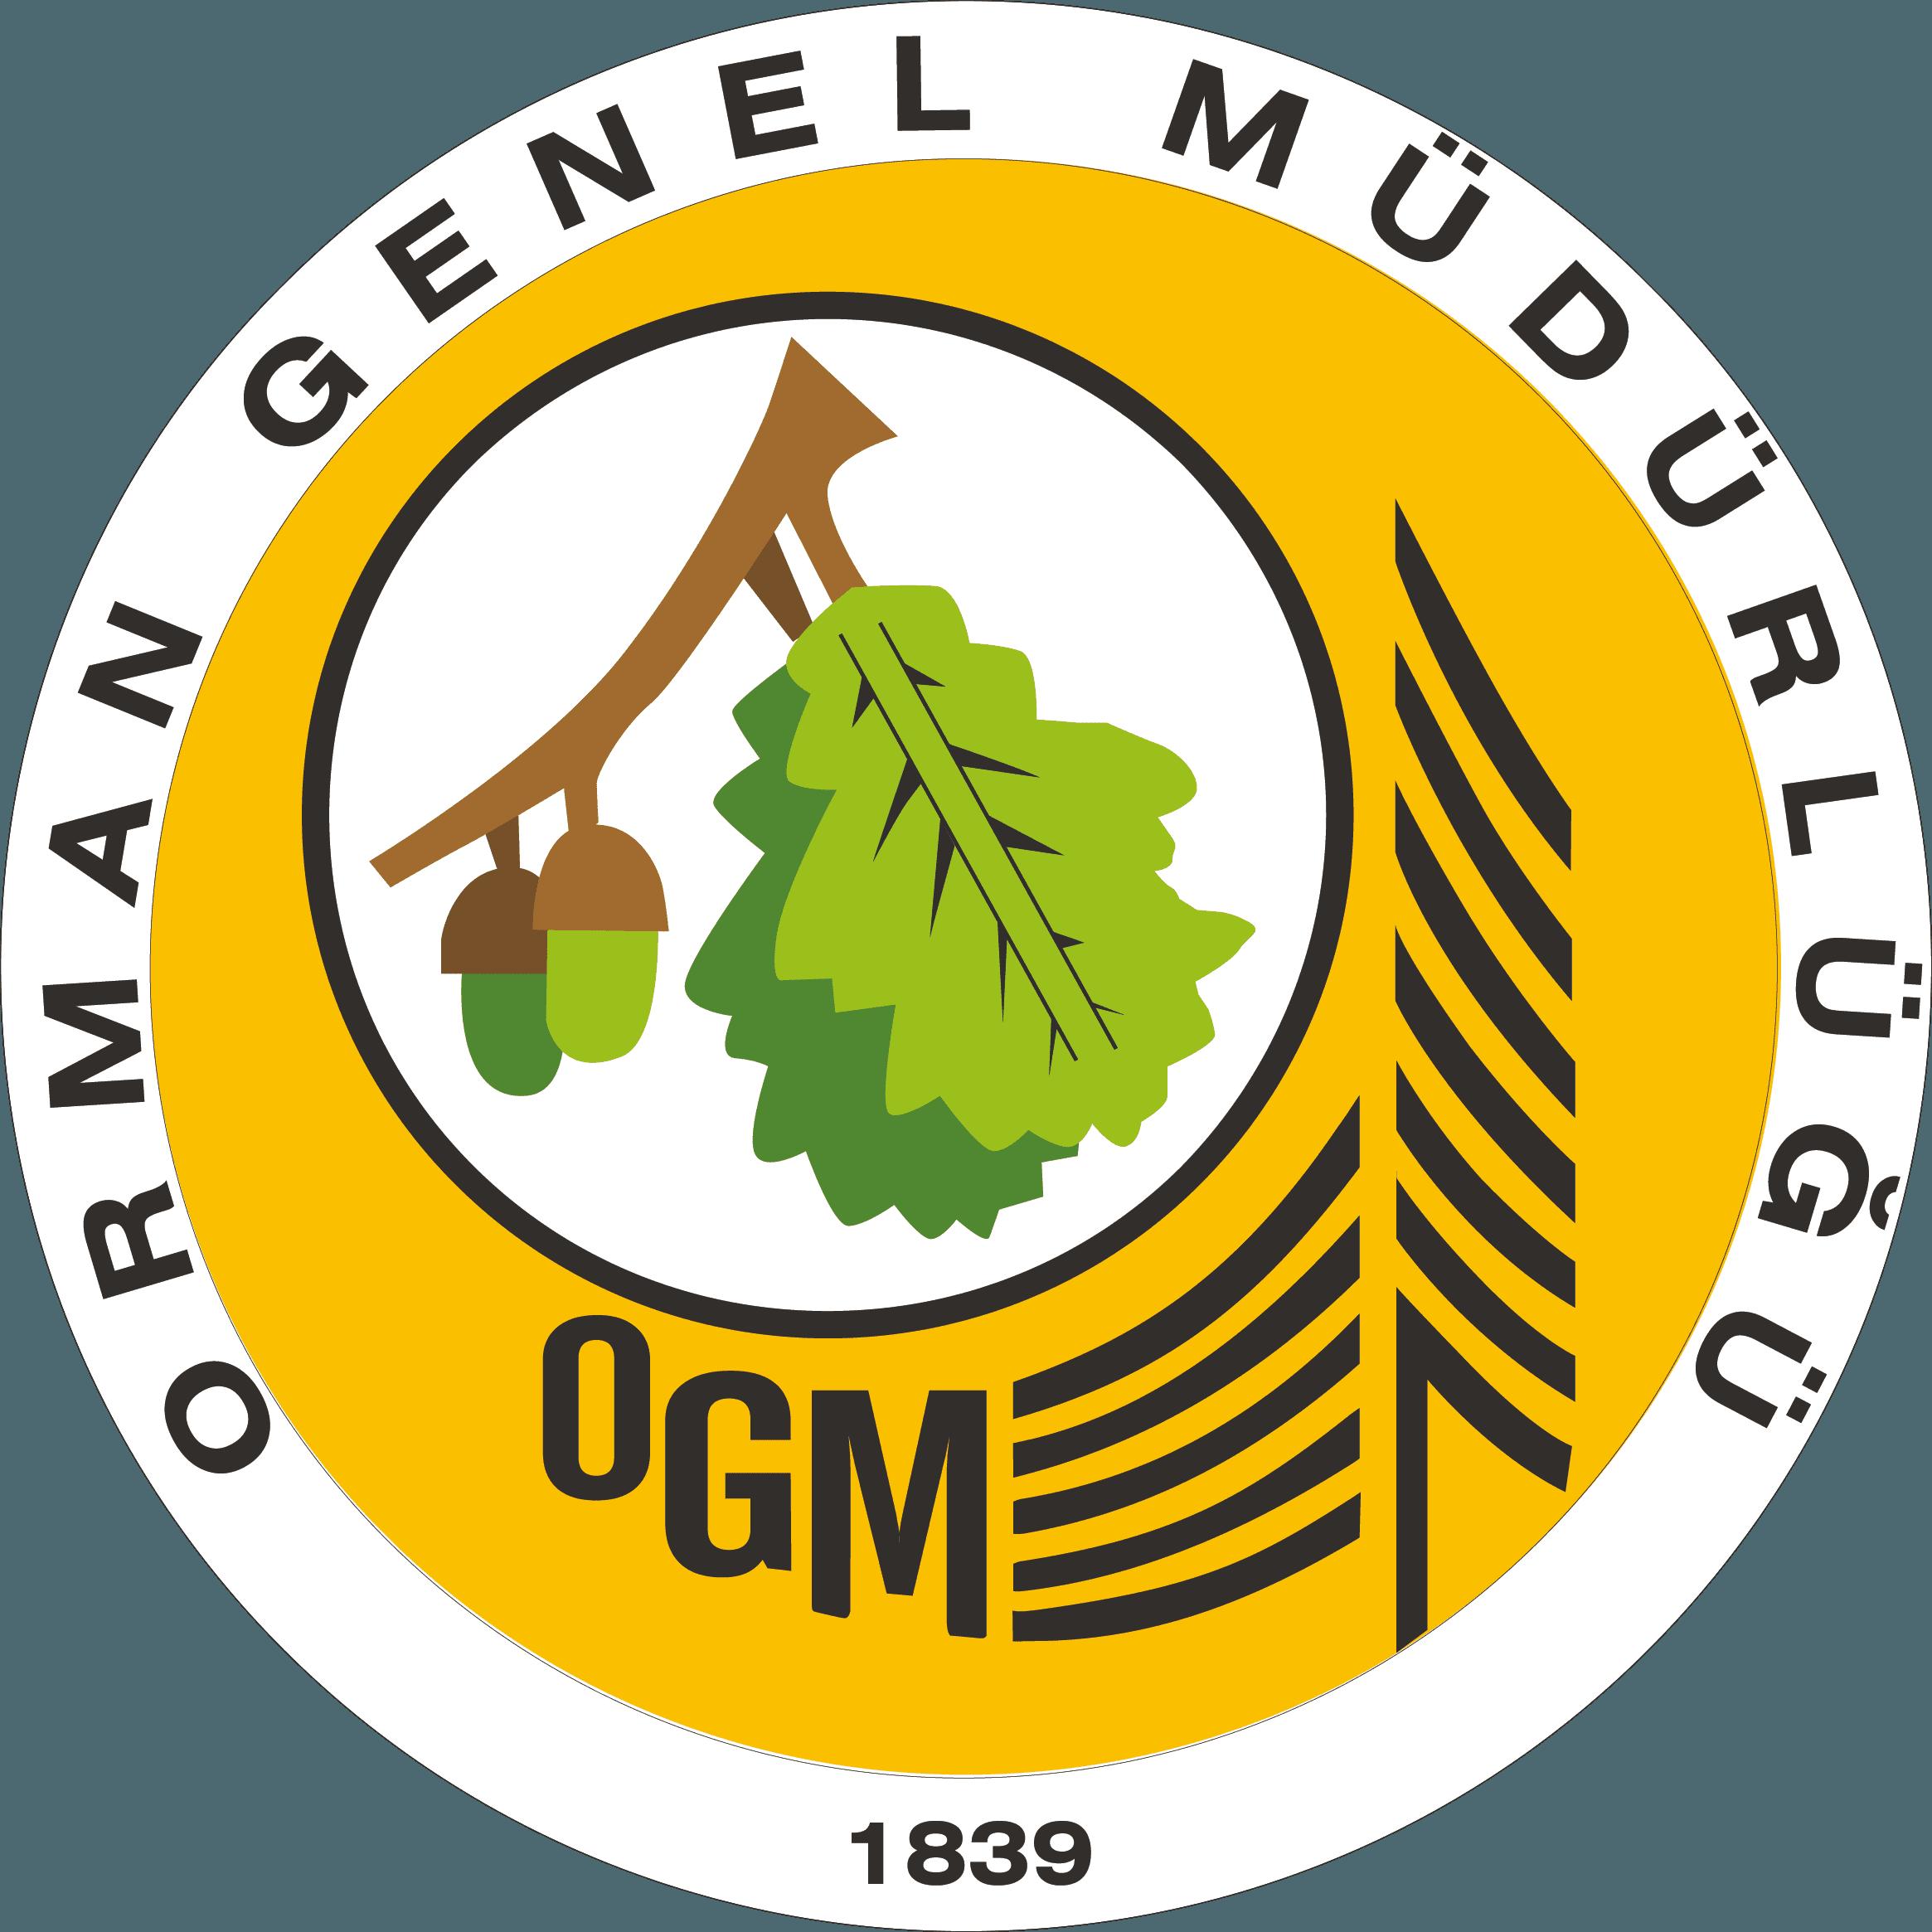 Orman Genel Müdürlüğü Logo [ogm.gov.tr] png